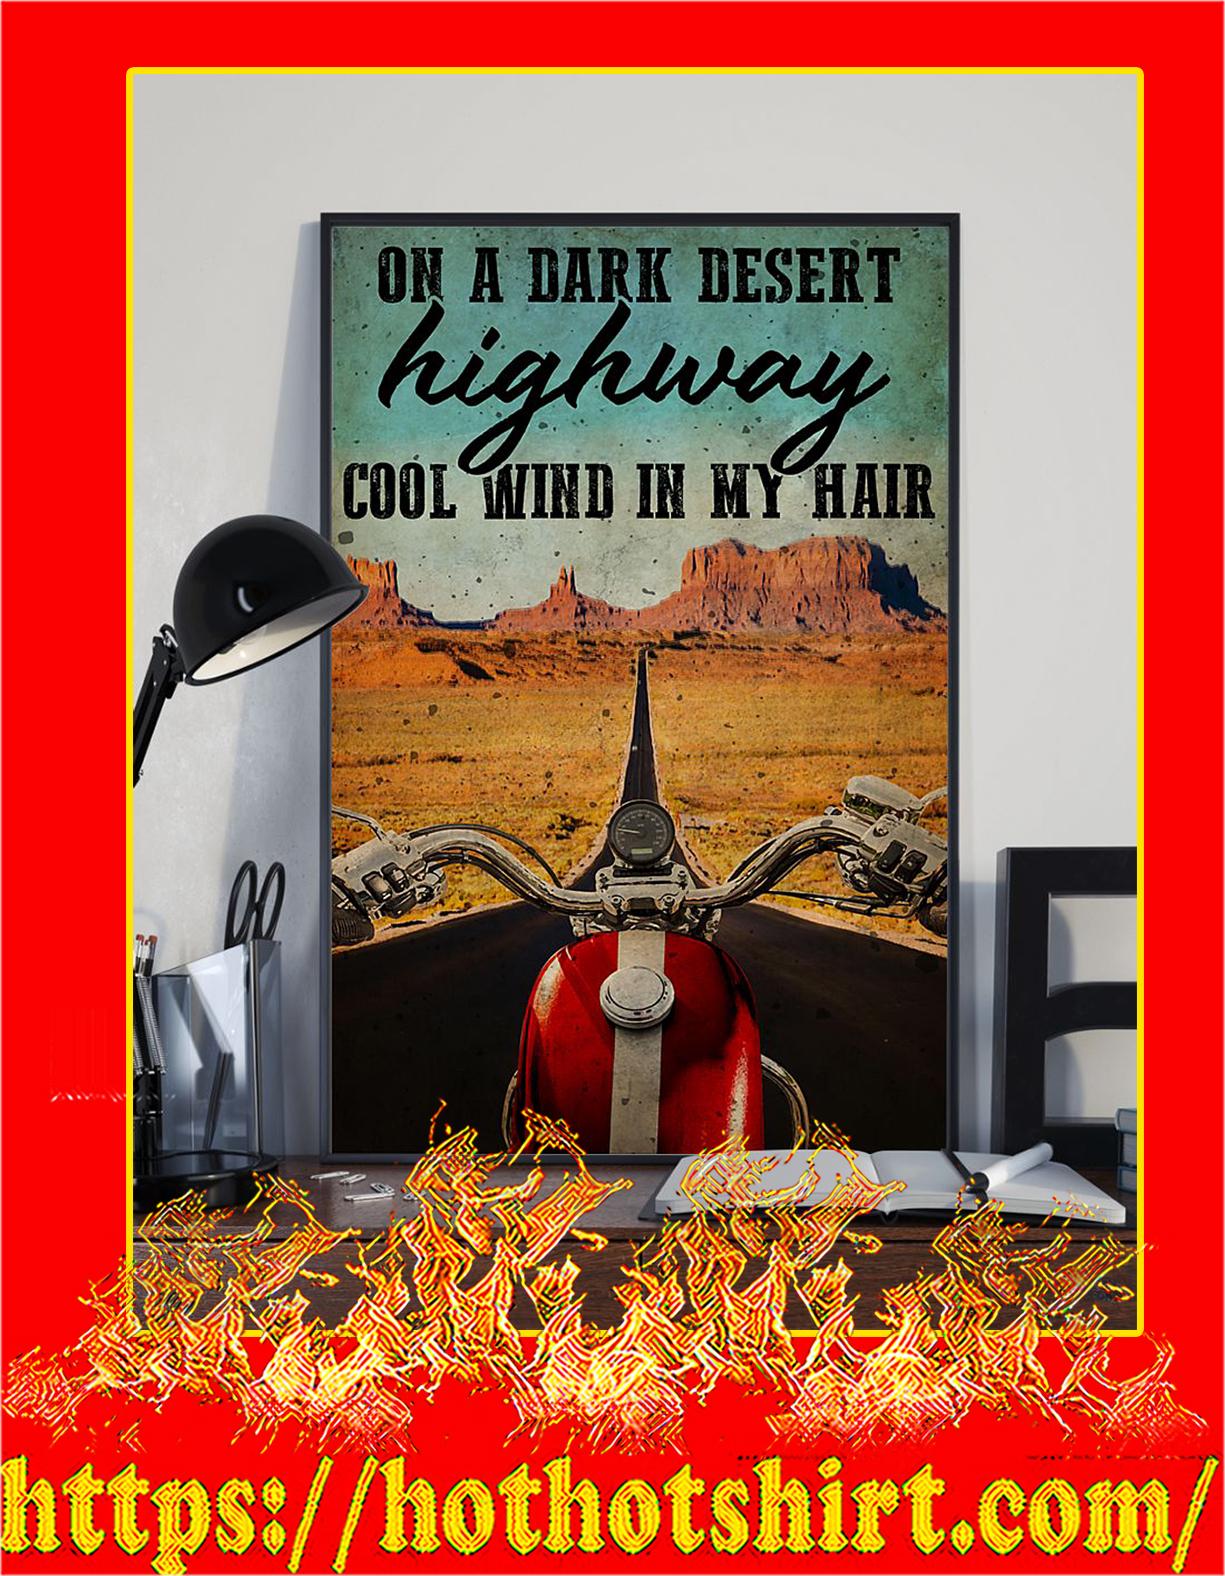 Biker On a dark desert highway cool wind in my hair poster - Pic 3